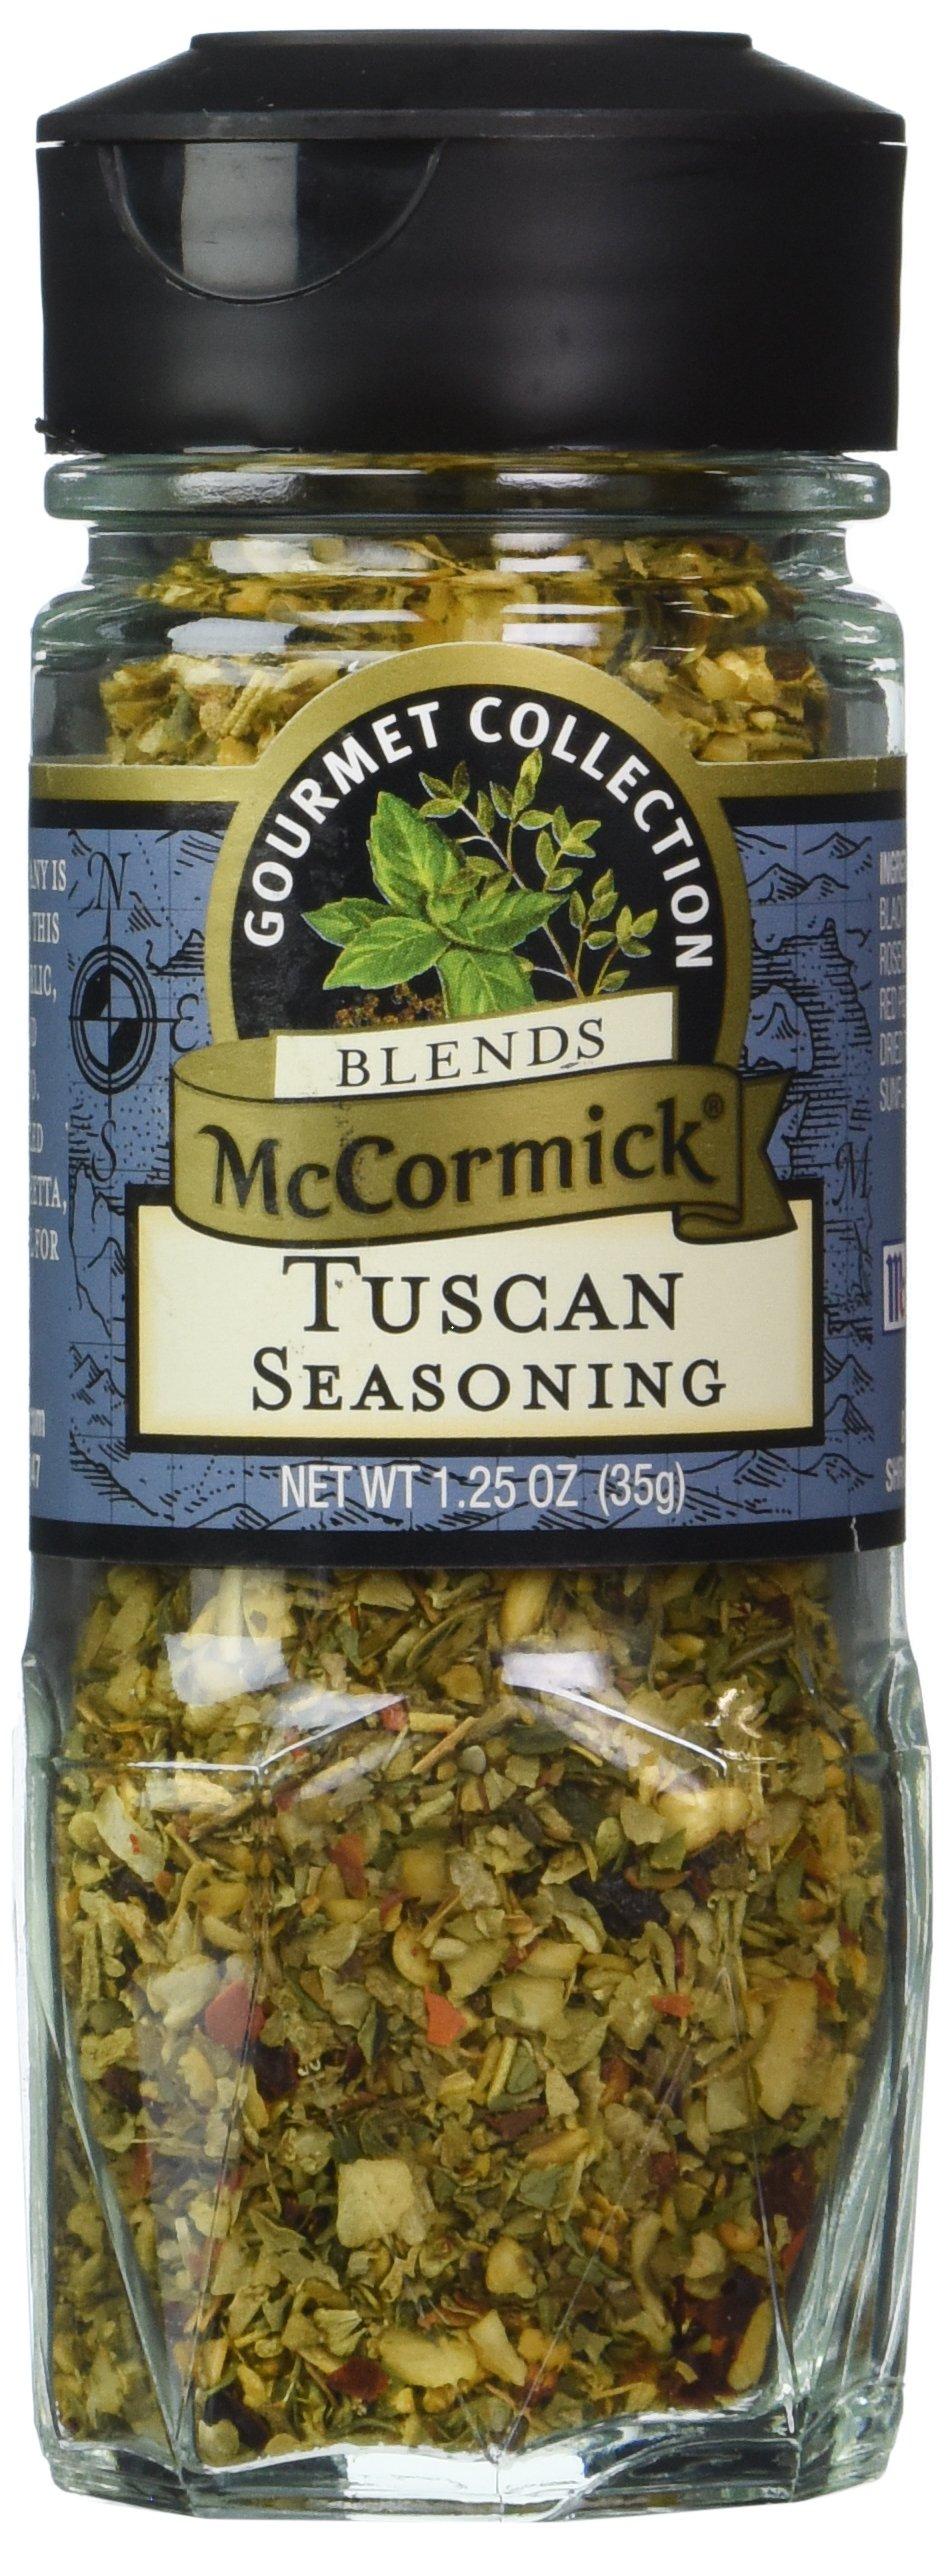 McCormick Gourmet Collection TUSCAN SEASONING 1.25oz (3 Pack)